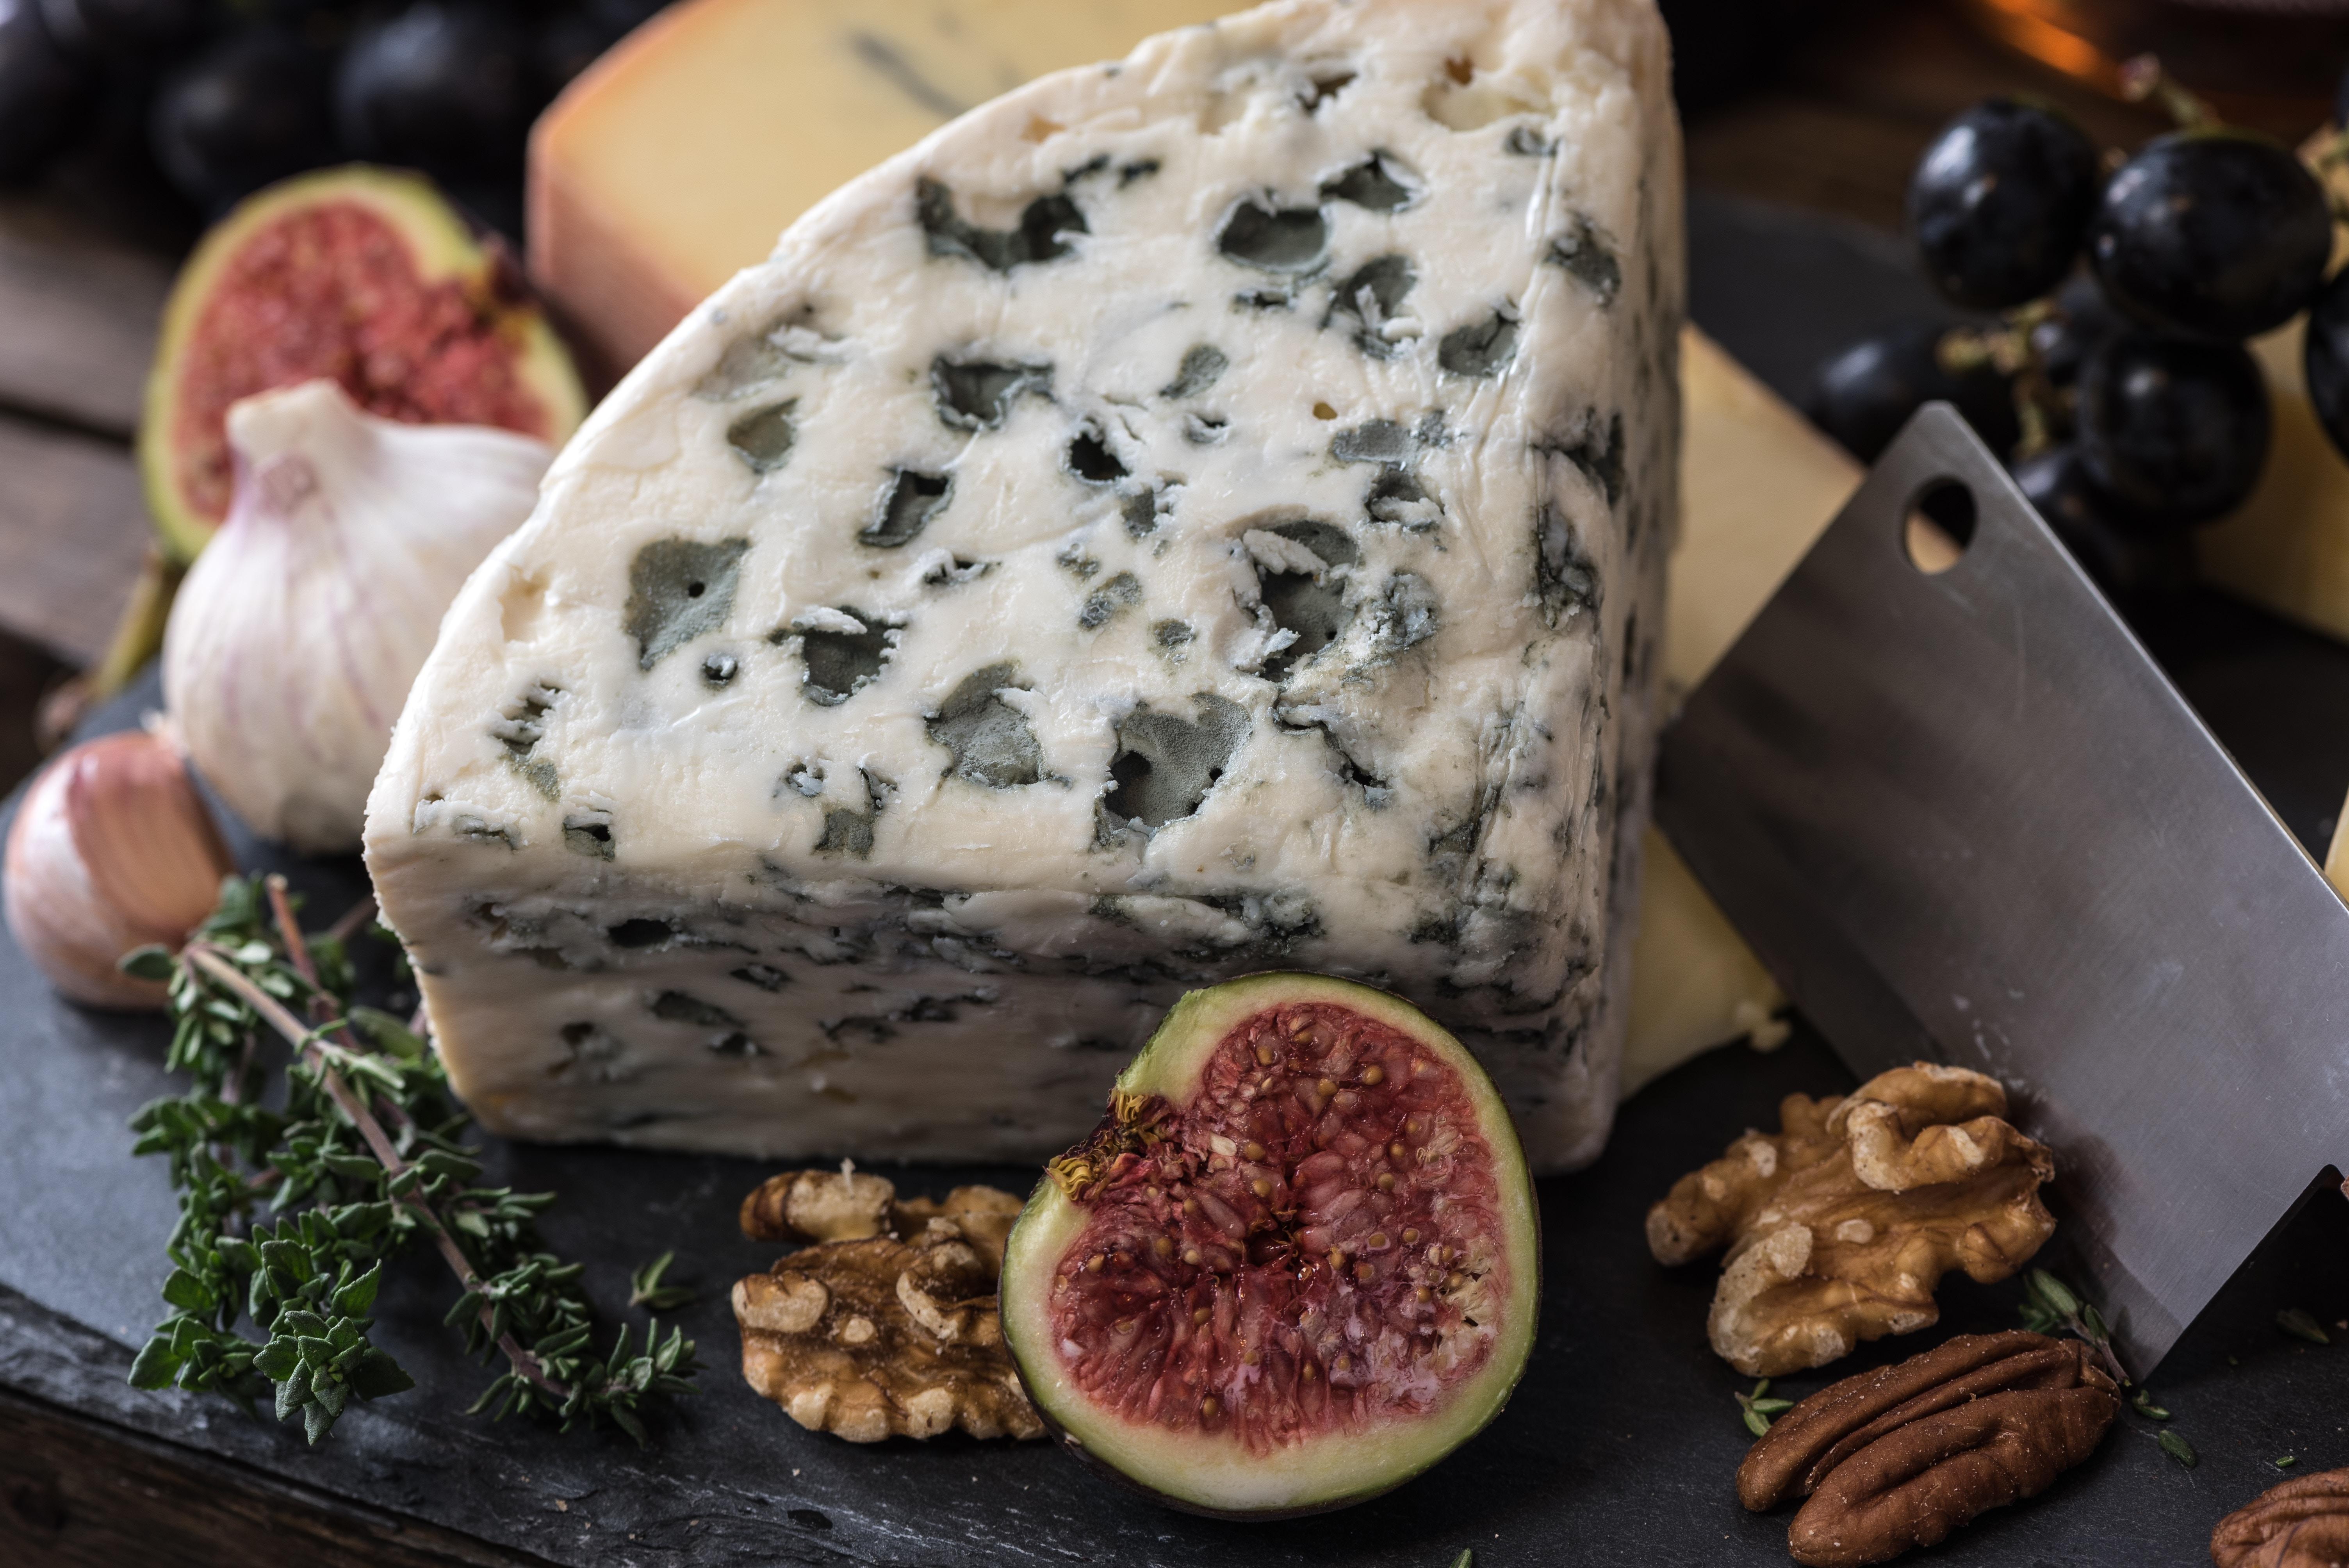 vegan cheese on platter